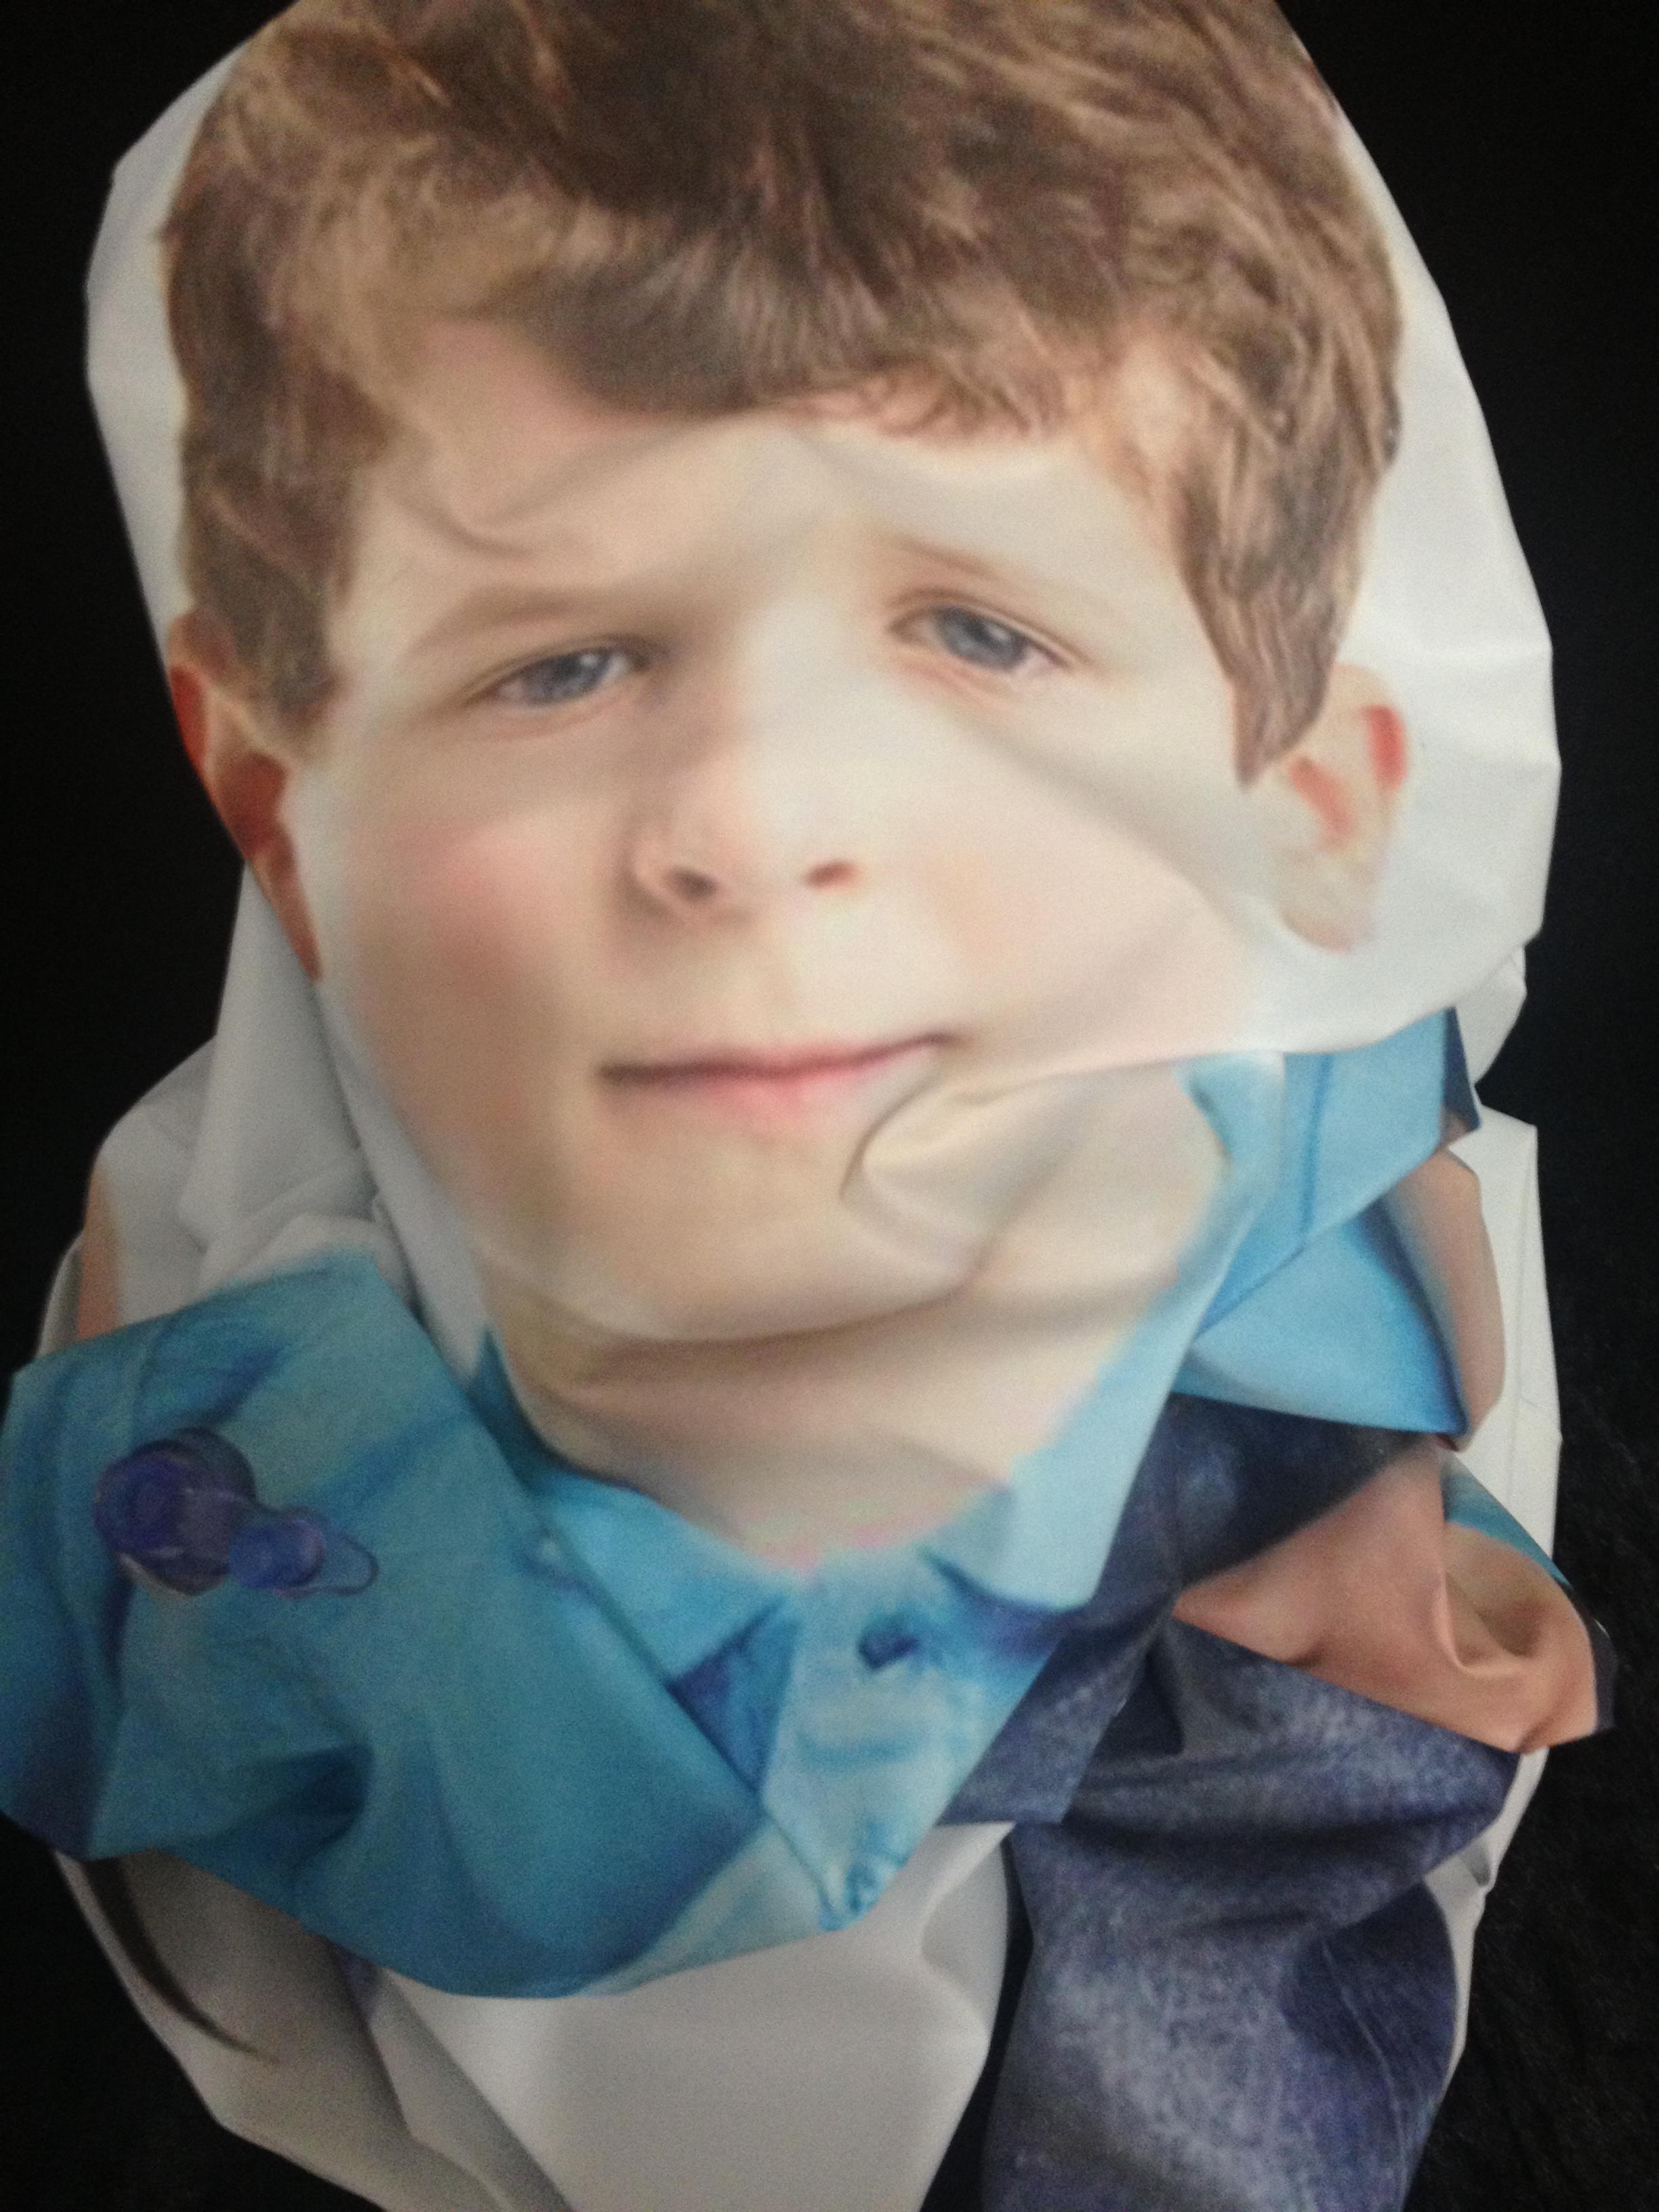 Deflated Boy (1).JPG